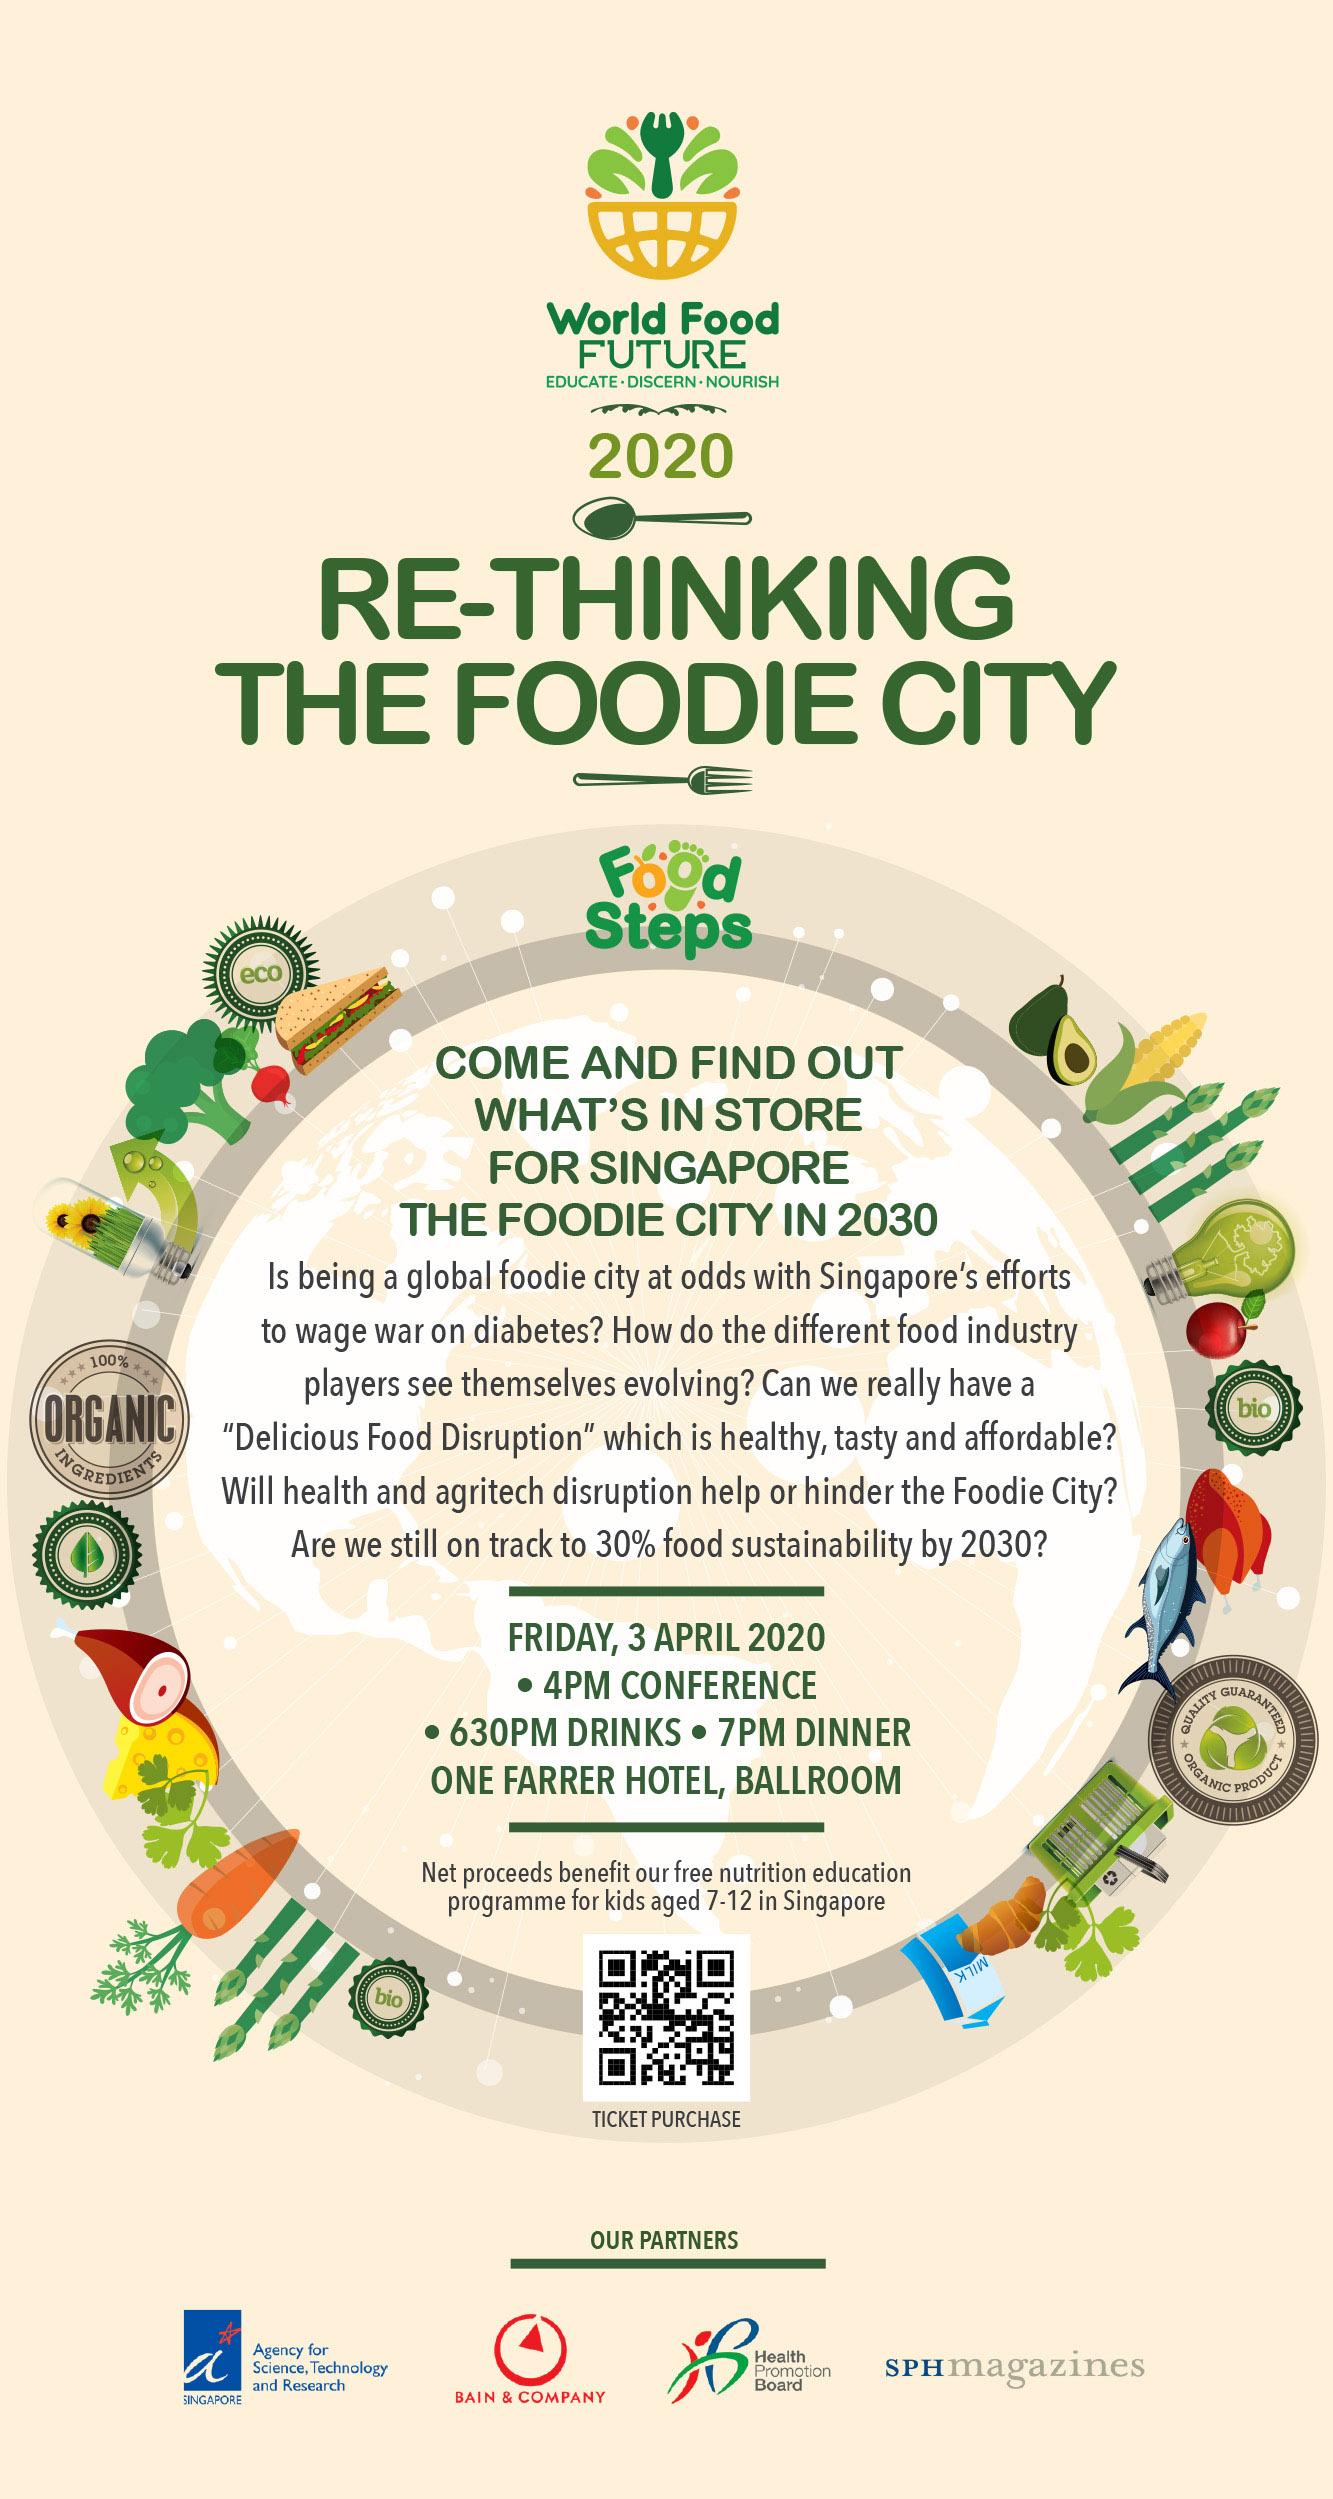 World-Food-Future-2020